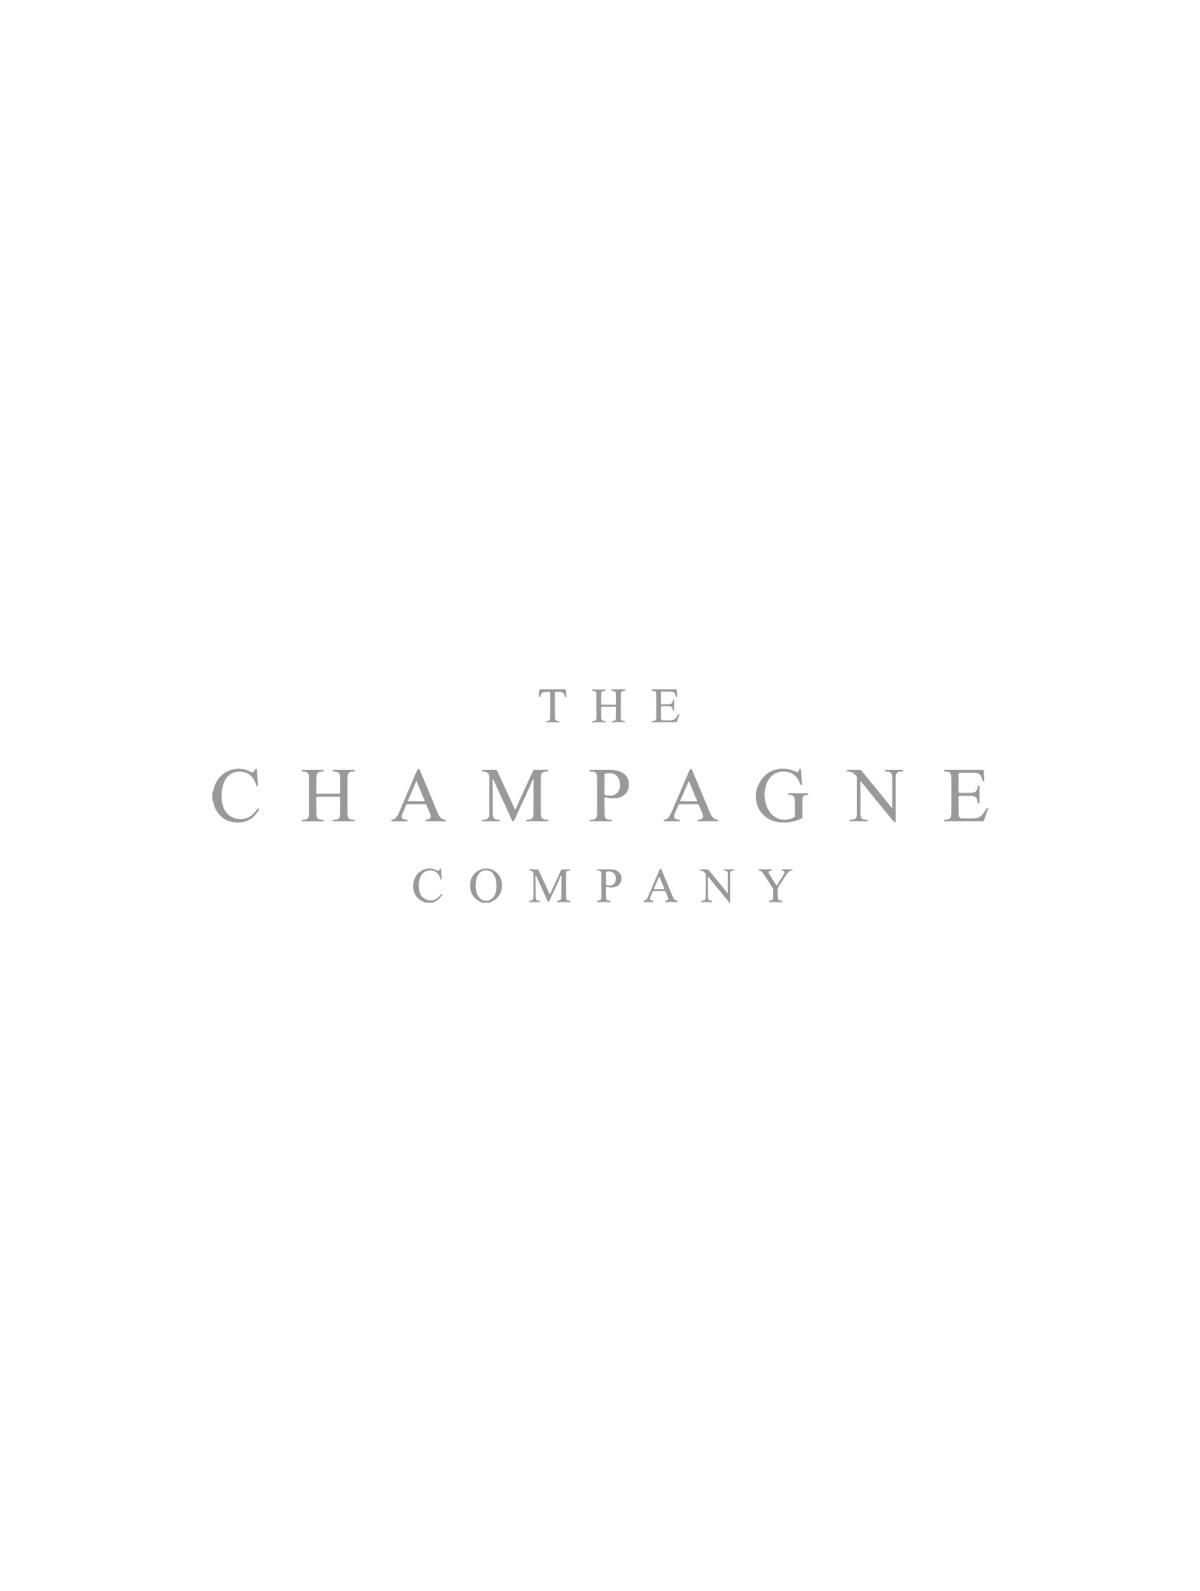 Newton Vineyard Unfiltered Merlot 2010 Red Wine California 70cl